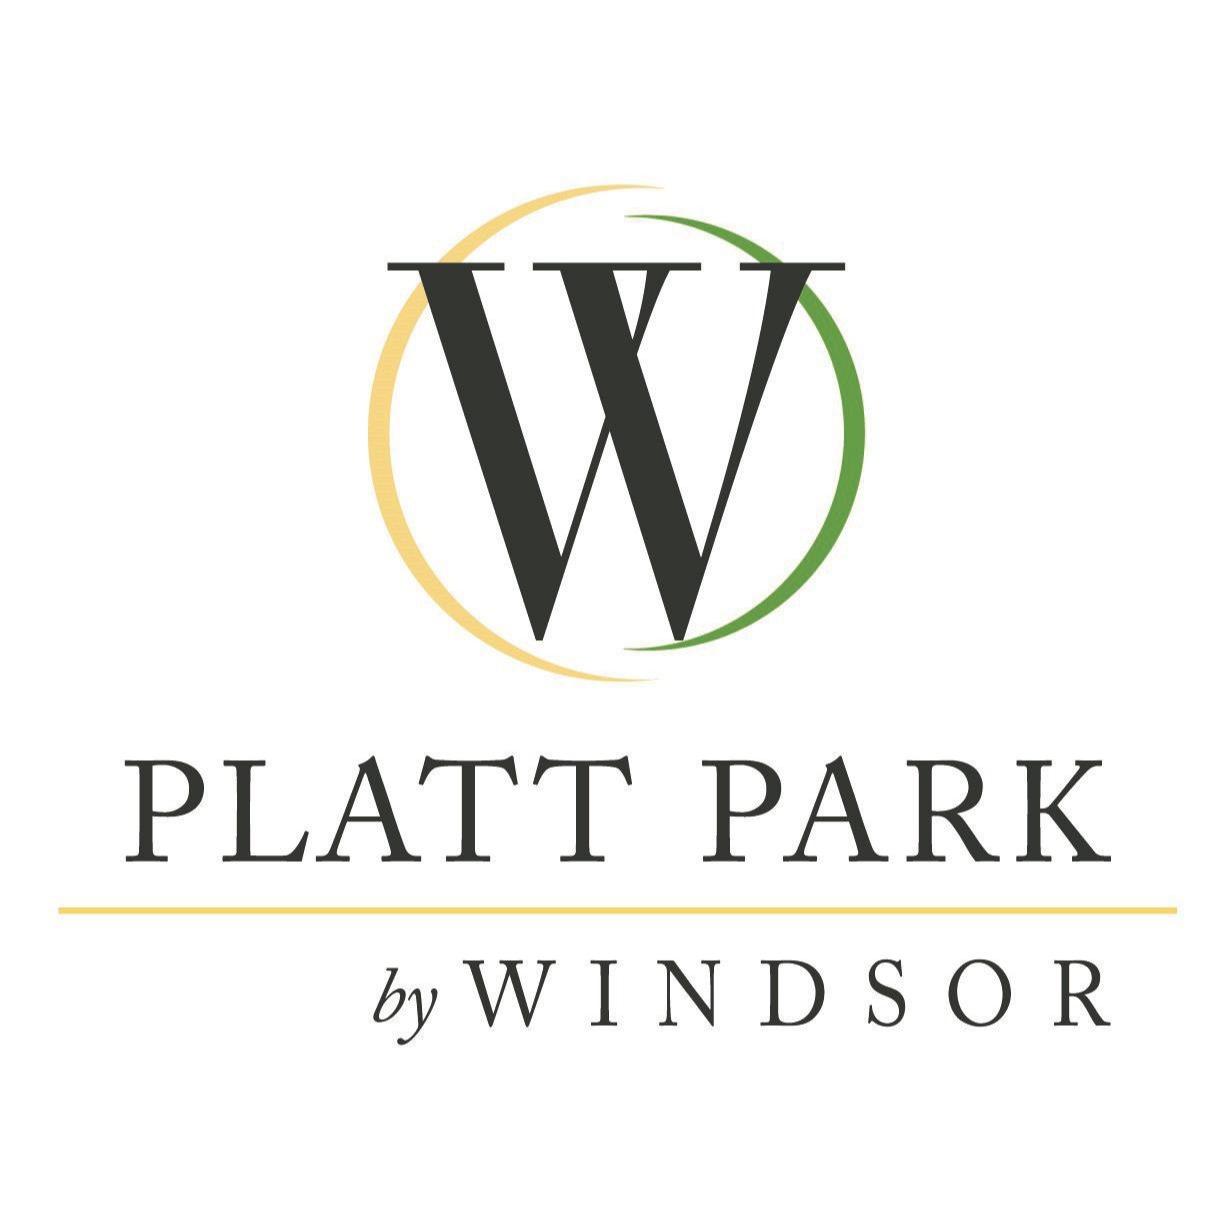 Platt Park by Windsor